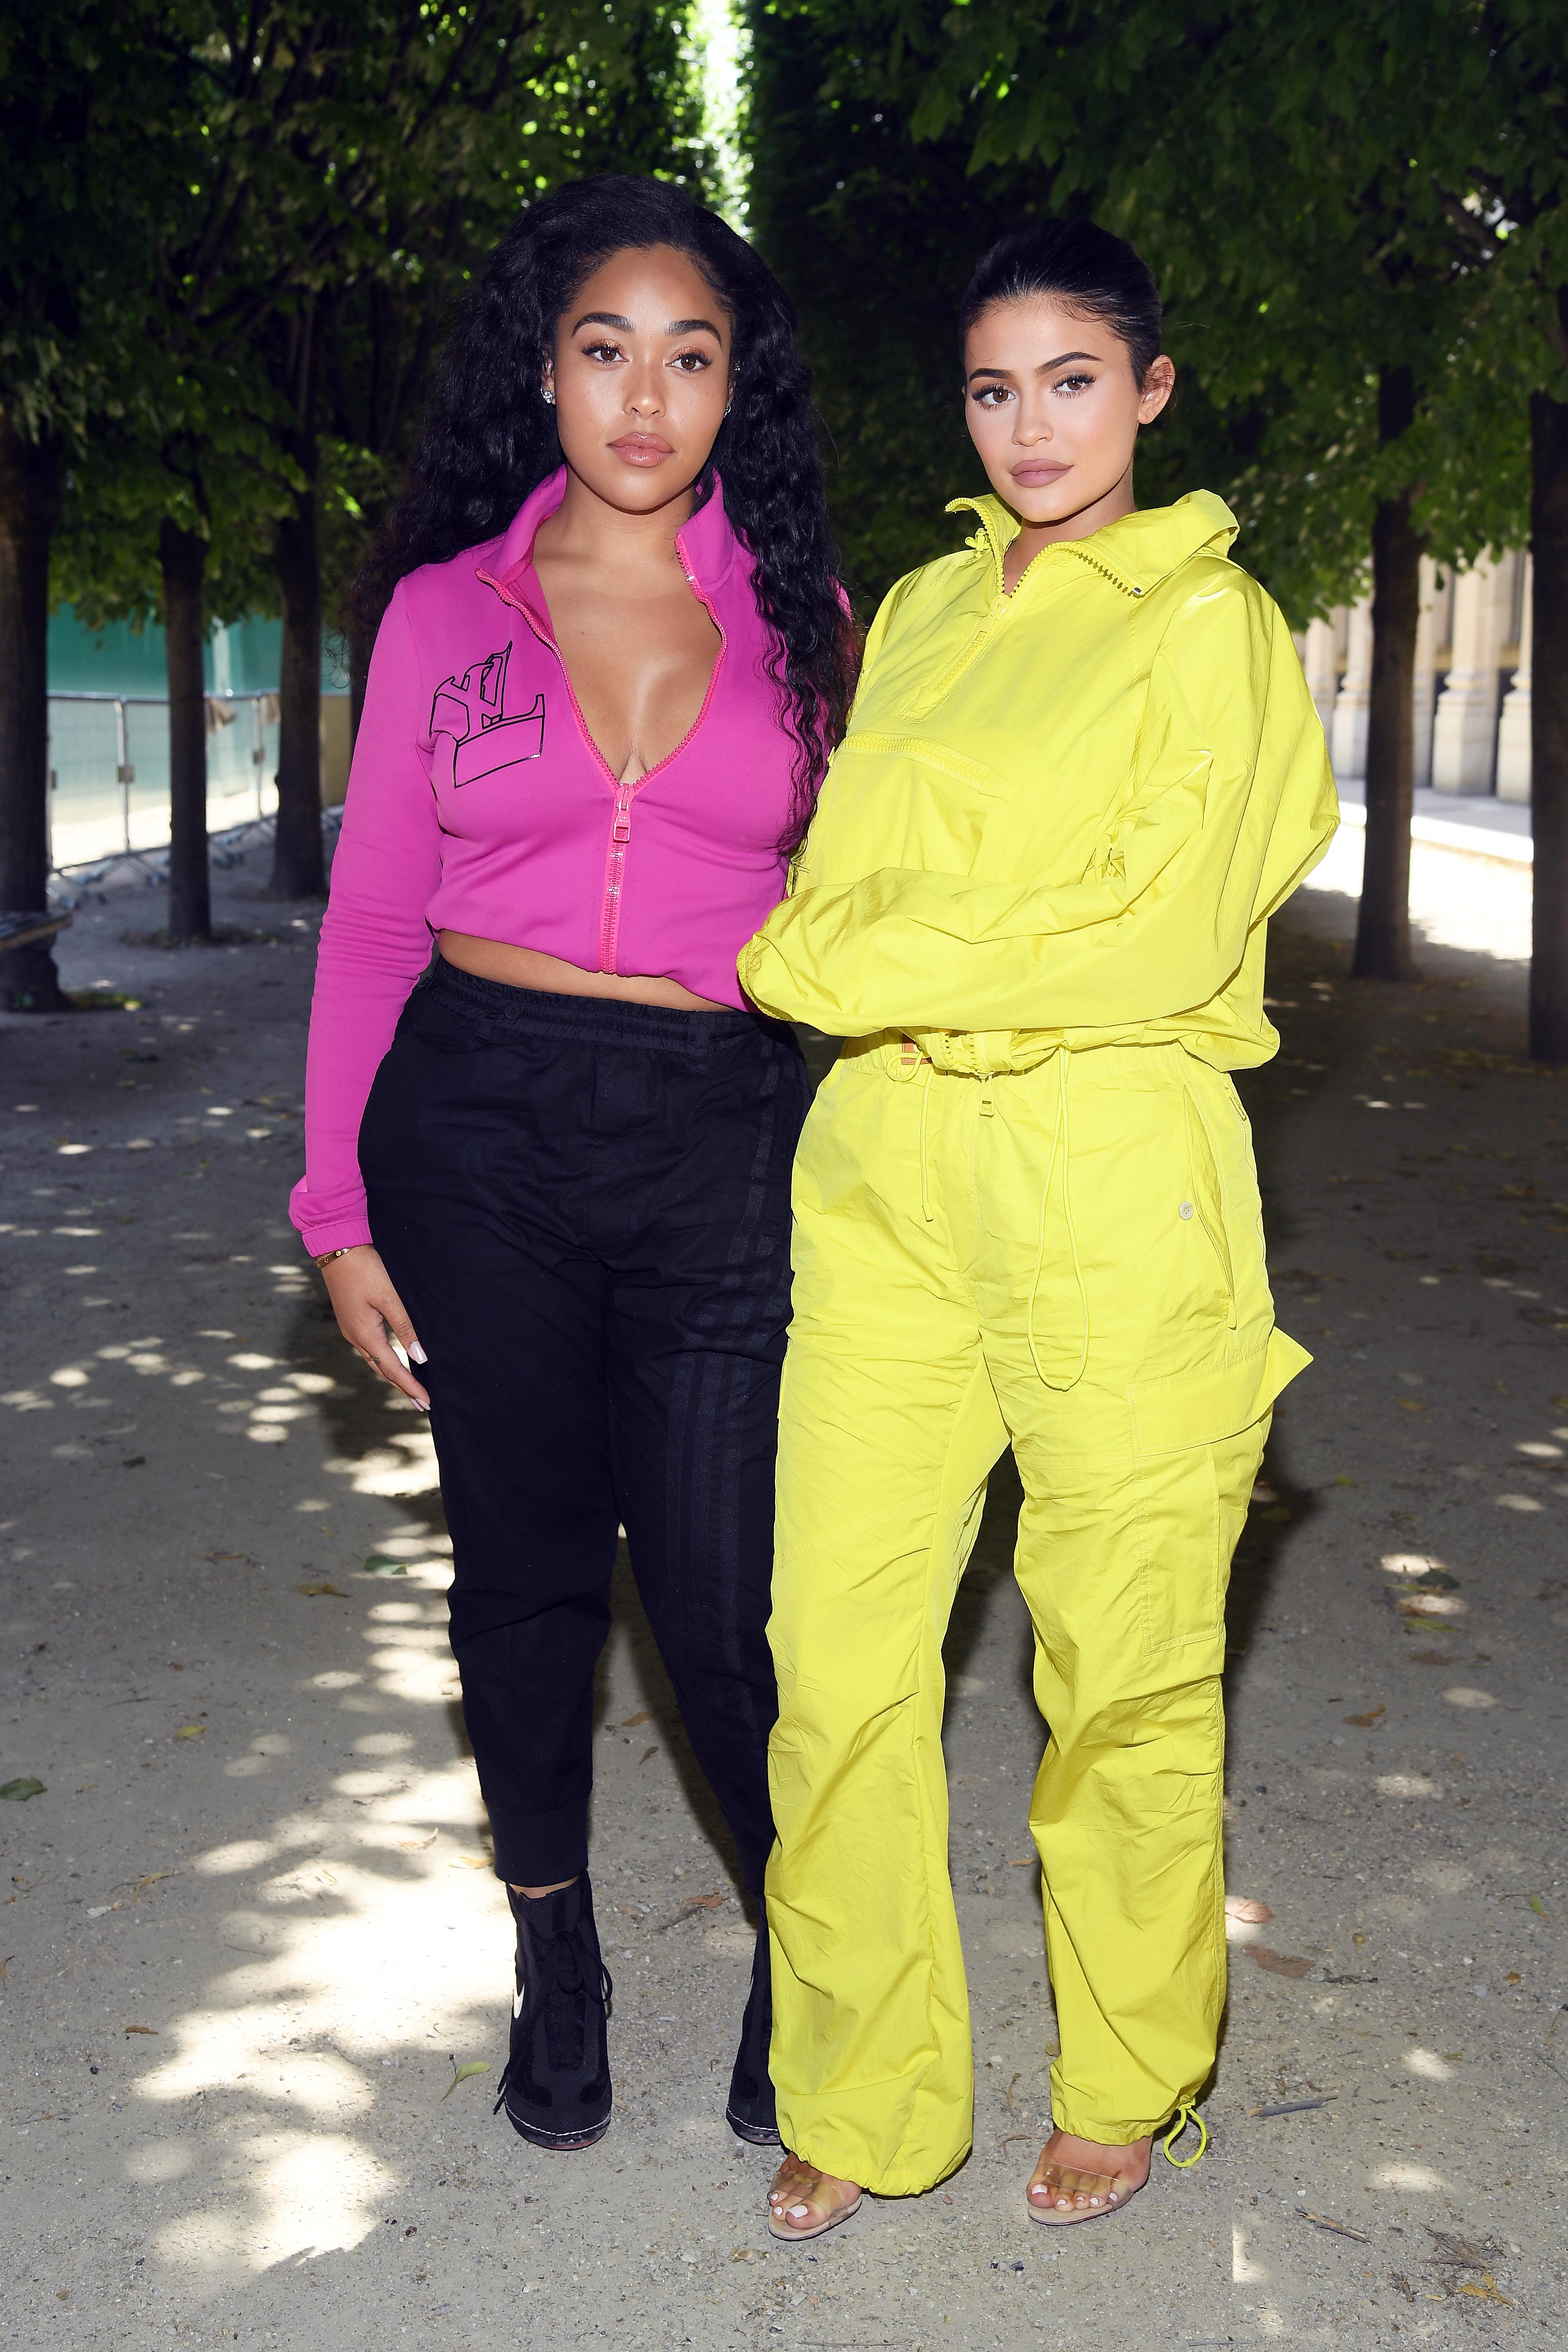 Kylie Jenner com a amiga Jordyn Woods no desfile masculino da Louis Vuitton.